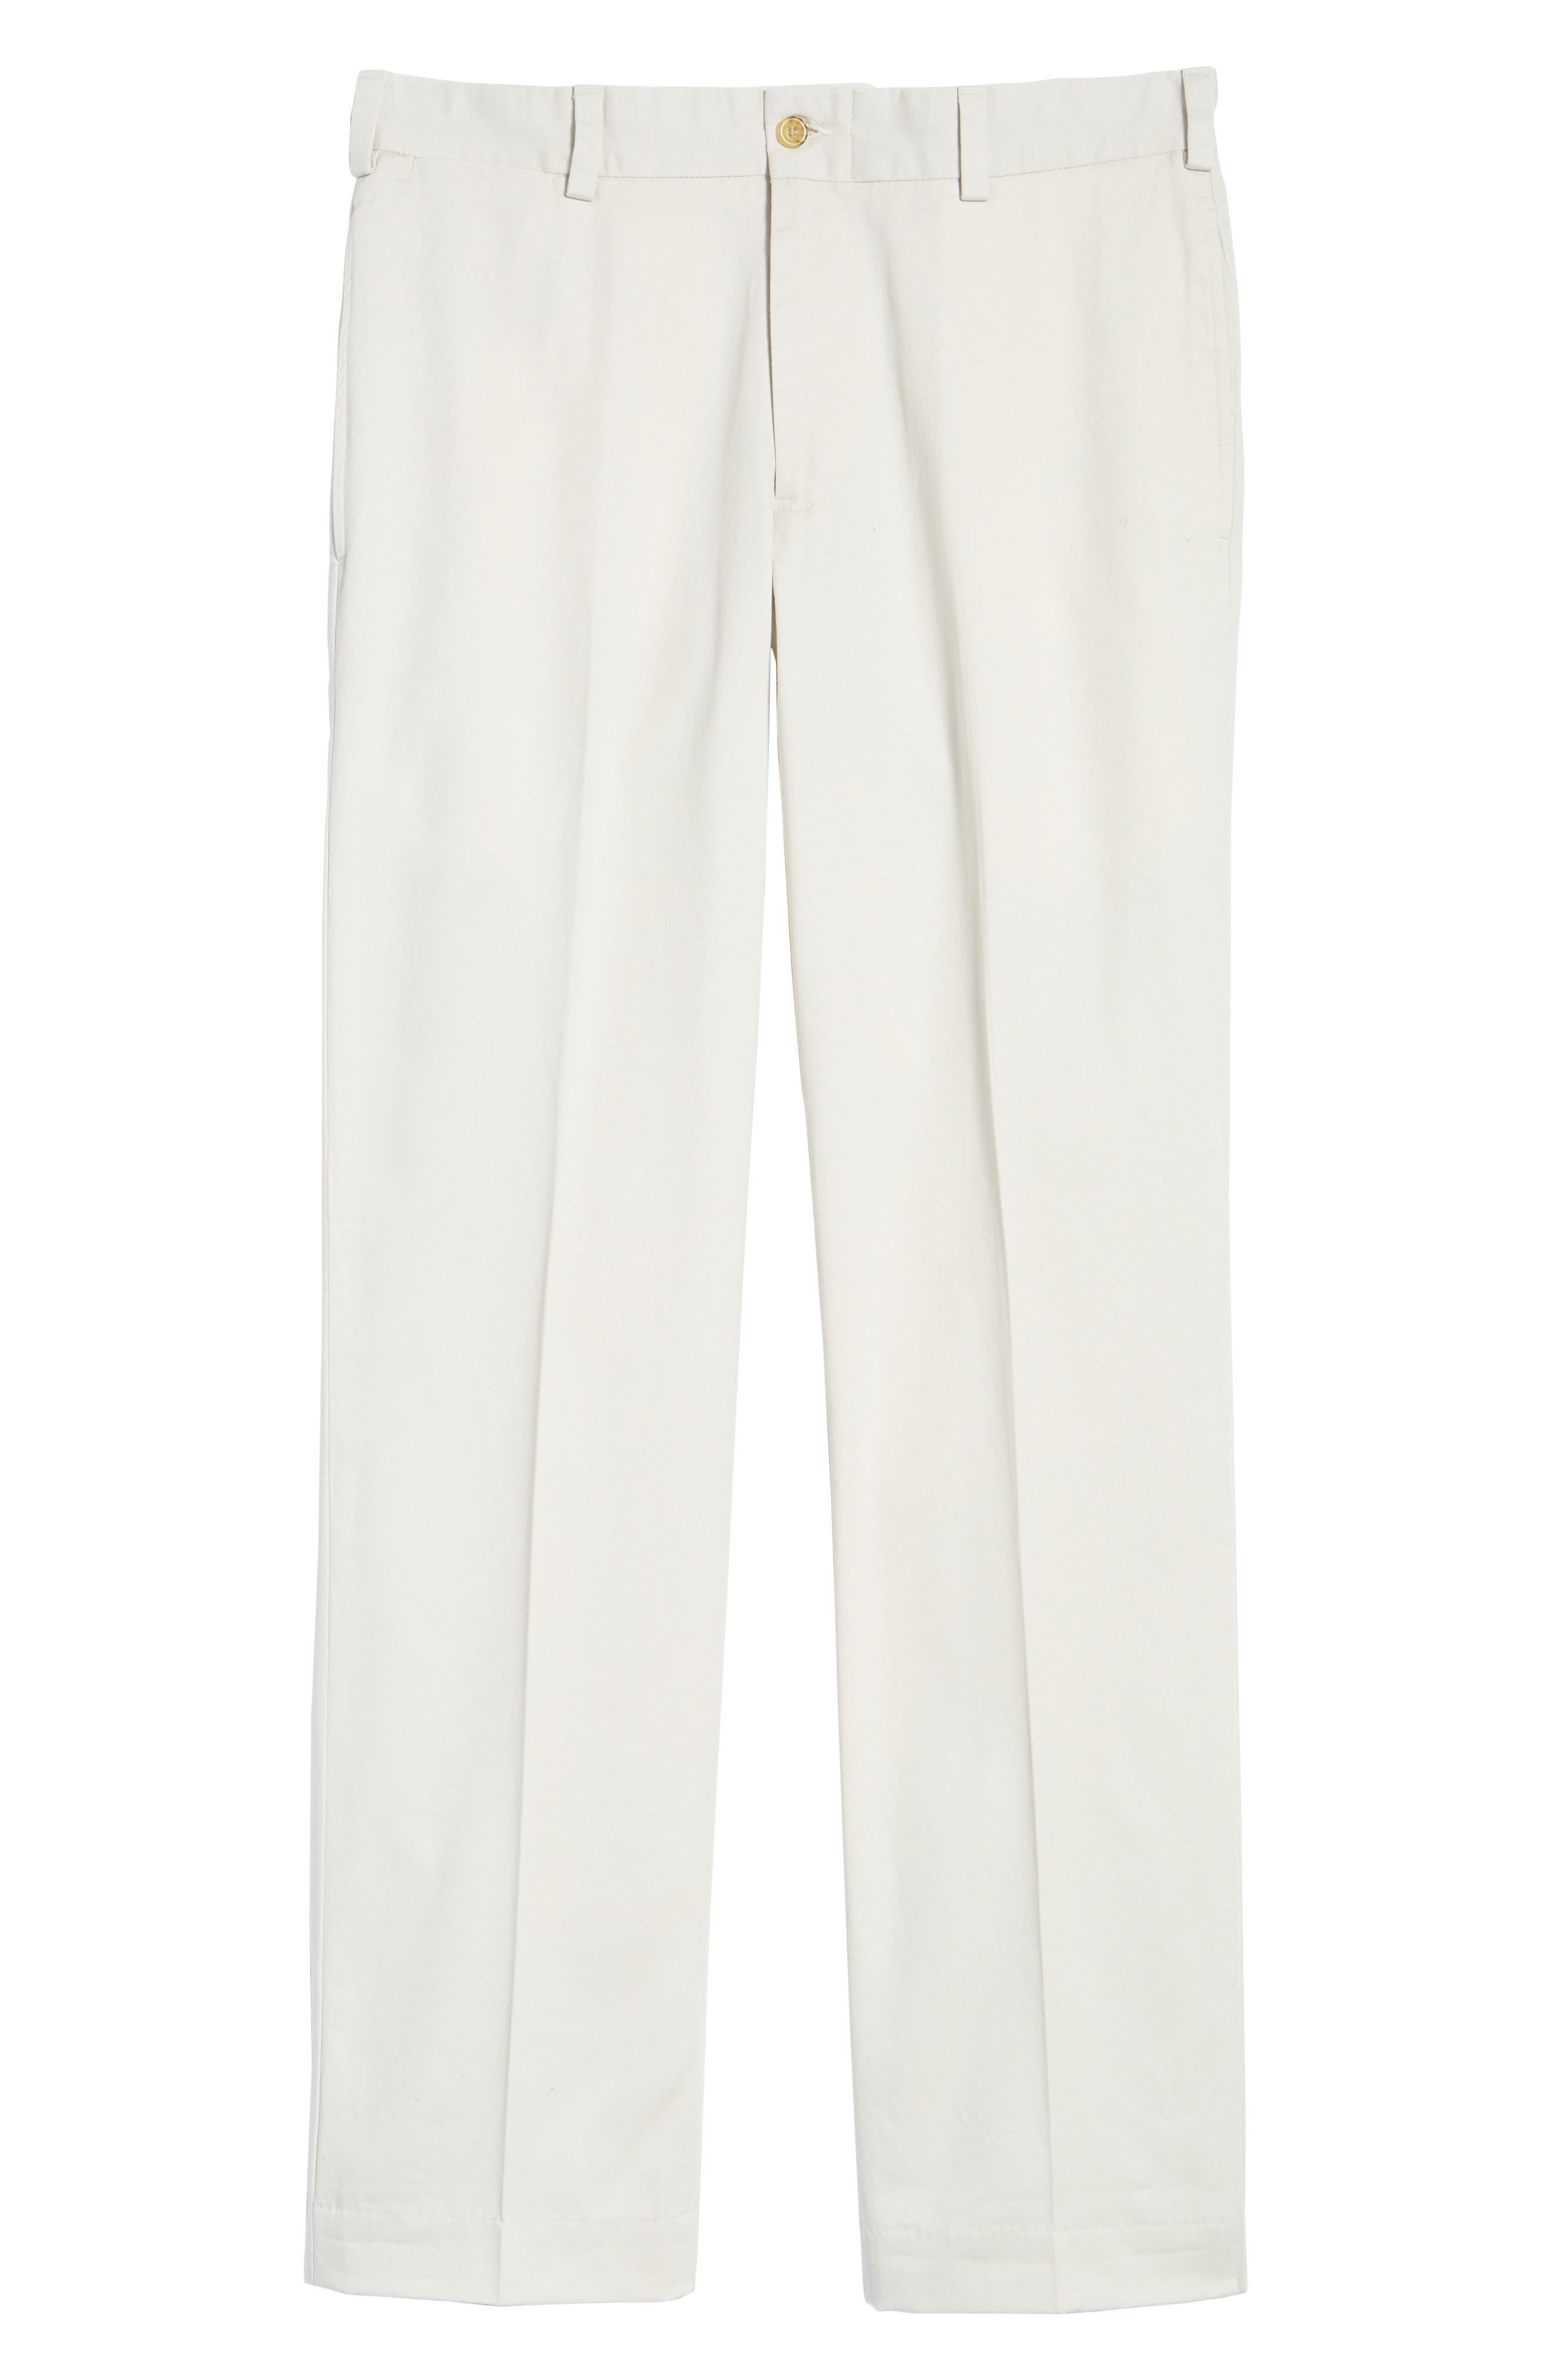 M2 Classic Fit Vintage Twill Flat Front Pants,                             Alternate thumbnail 6, color,                             270